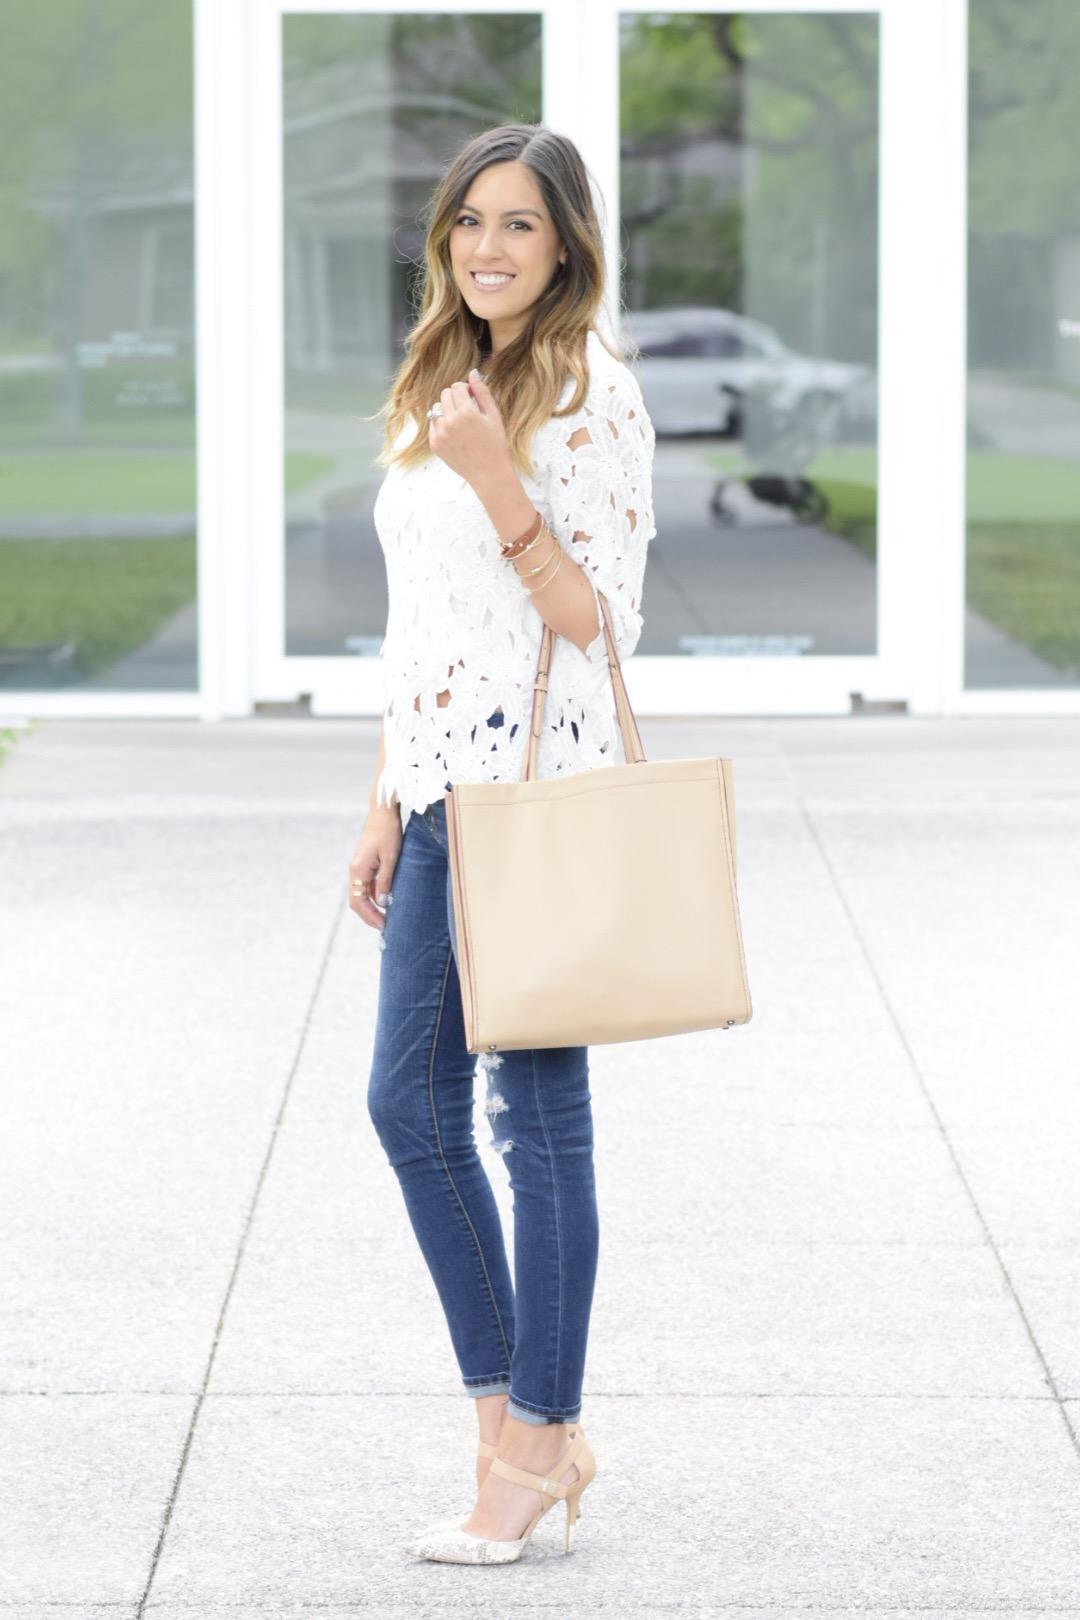 style the girl crochet blouse 4